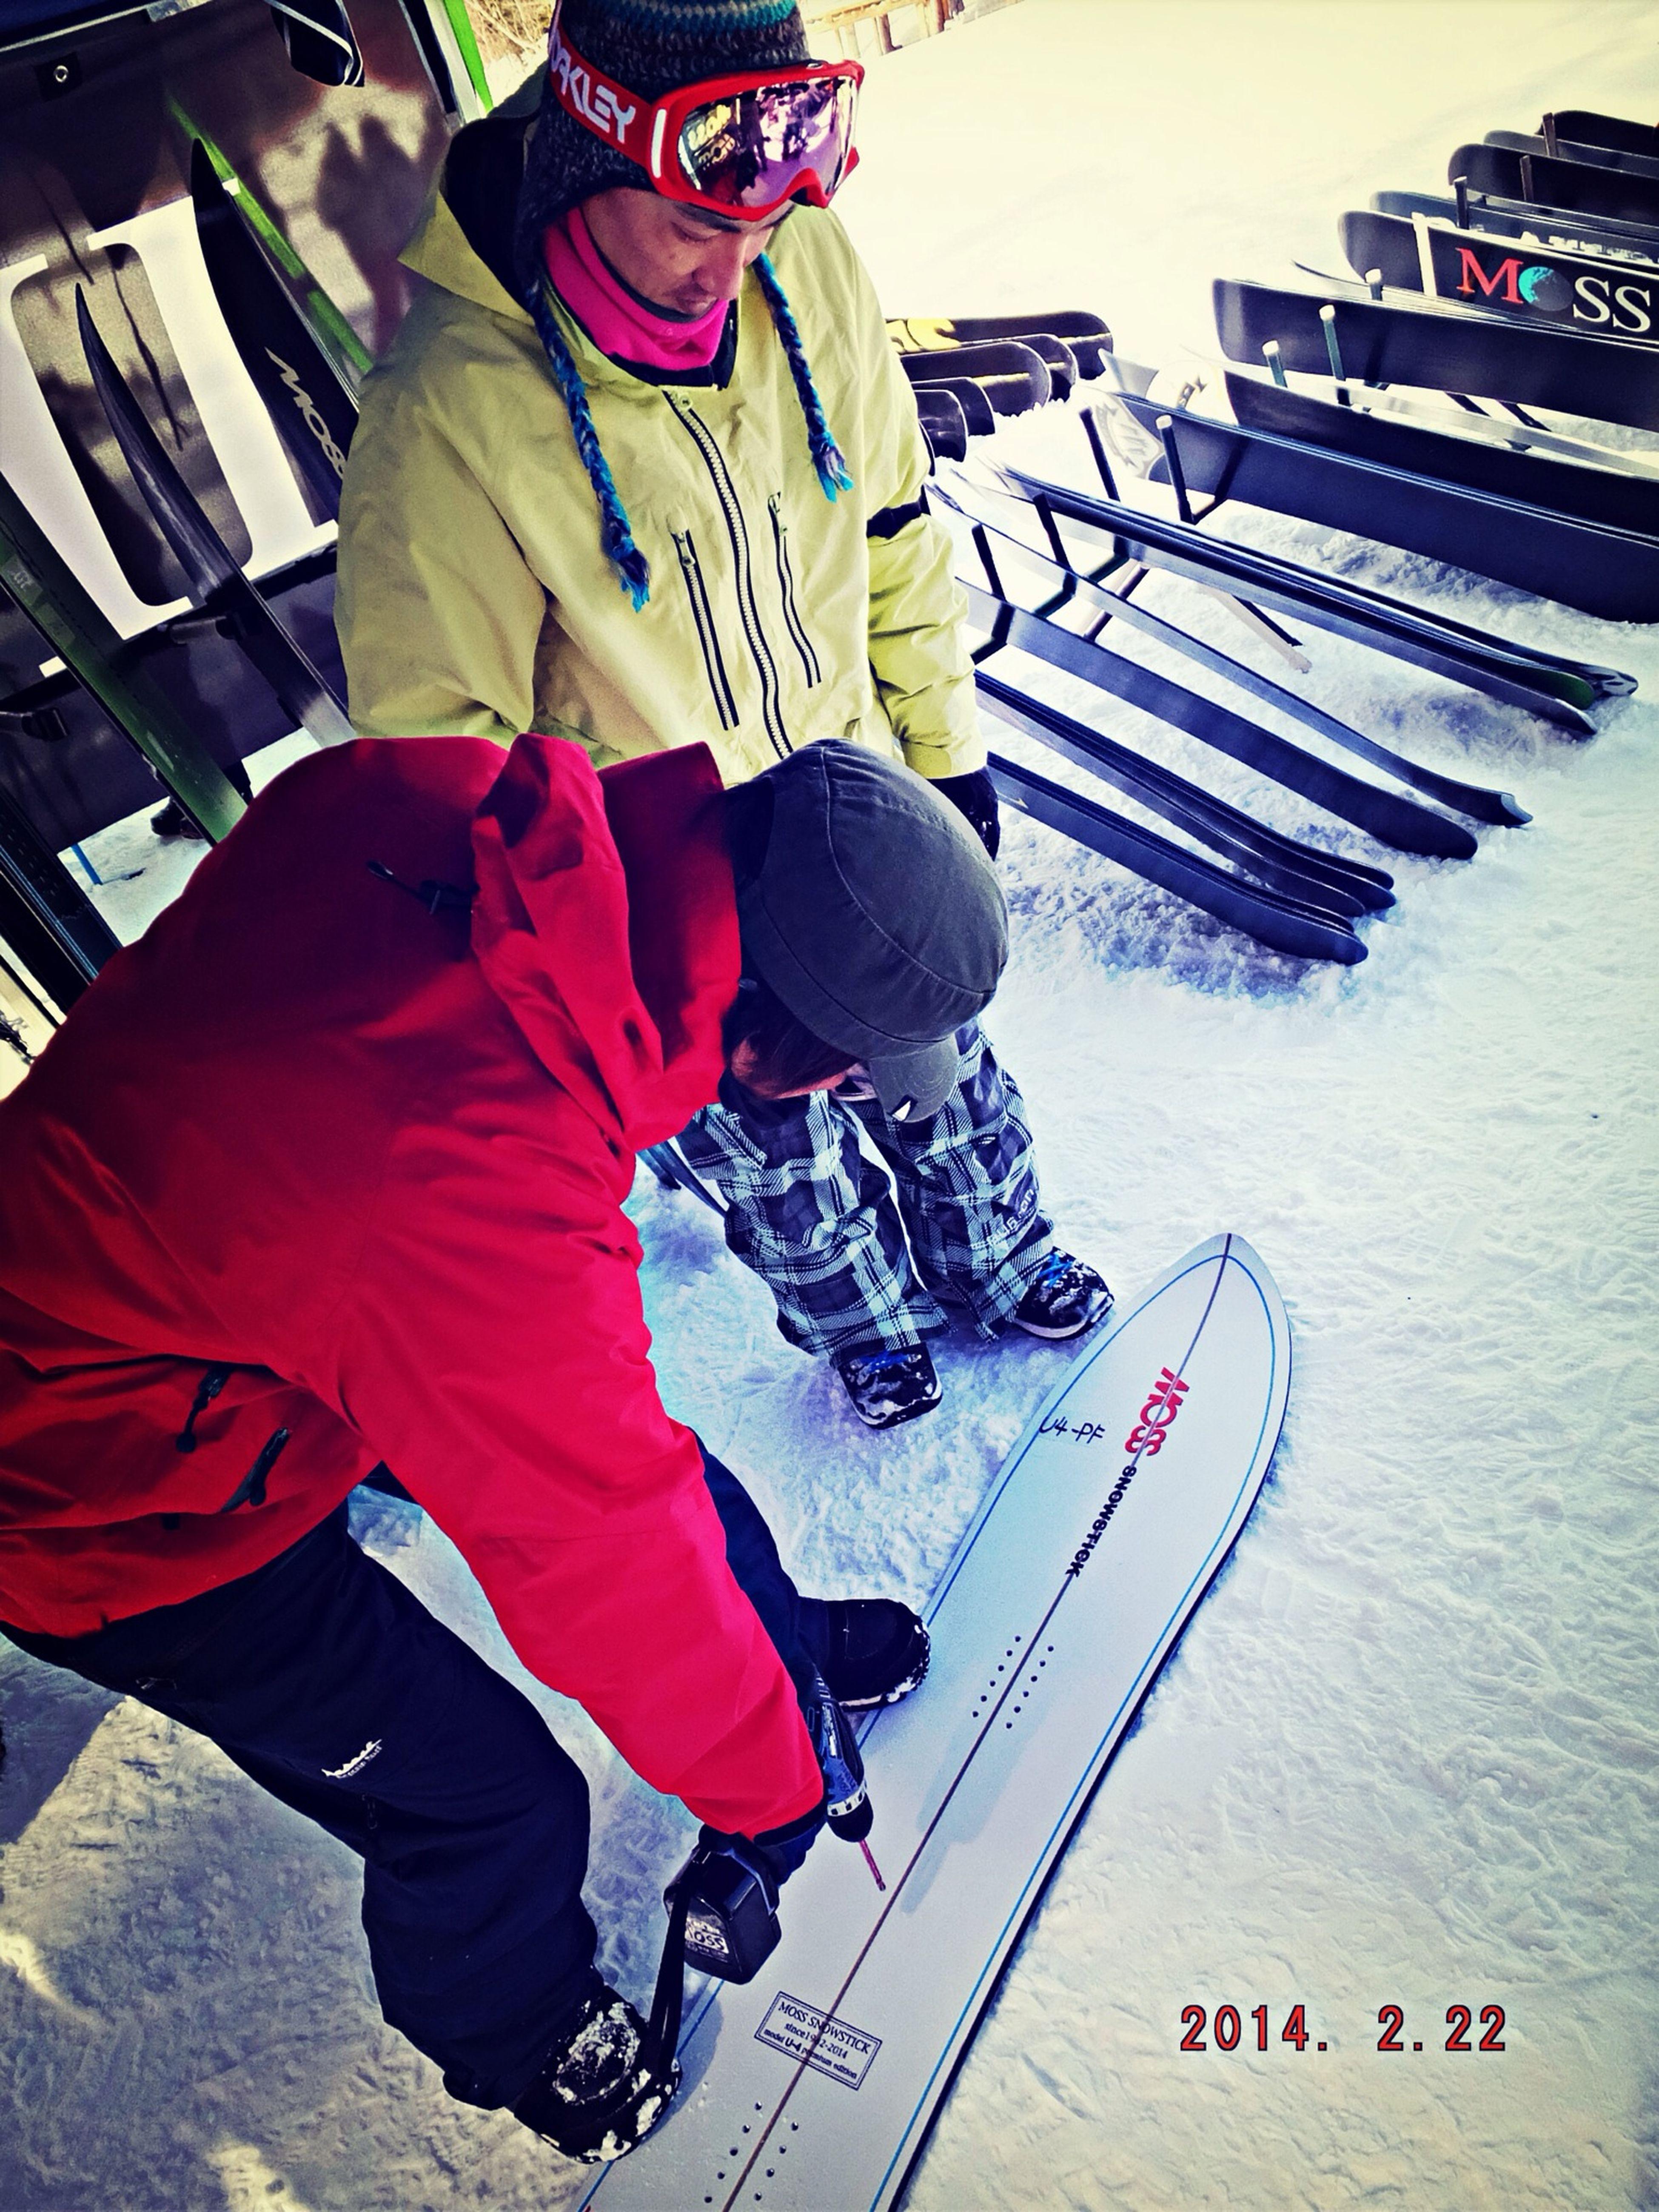 Enjoying Life Snowboarding Backcountry Moss